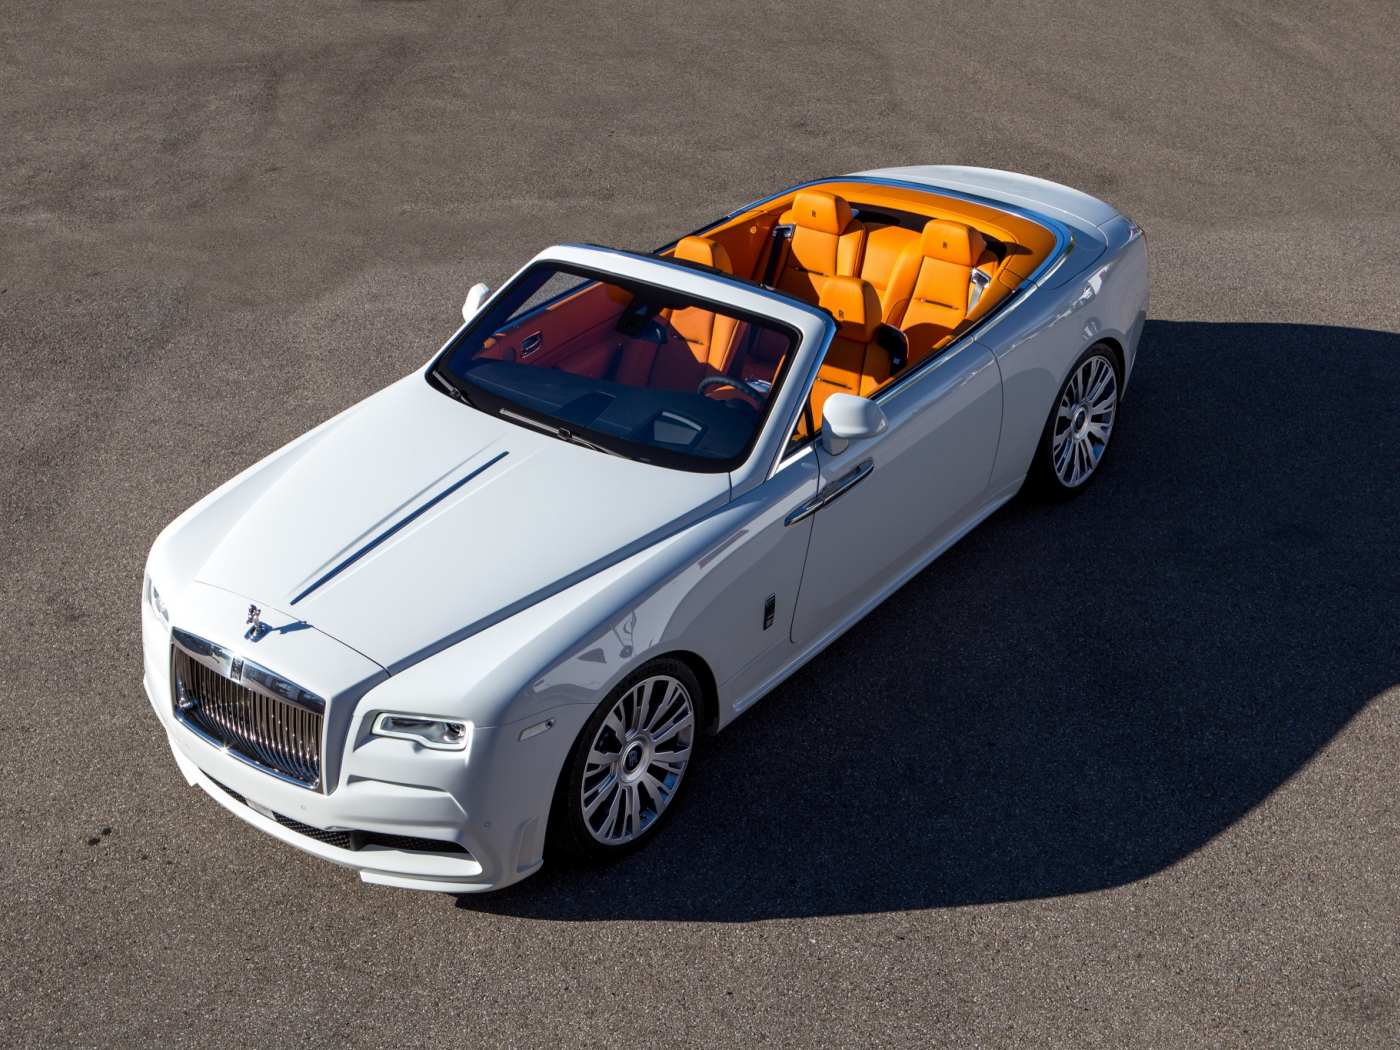 1400x1050 wallpaper White Rolls-Royce Dawn, top view, luxury car